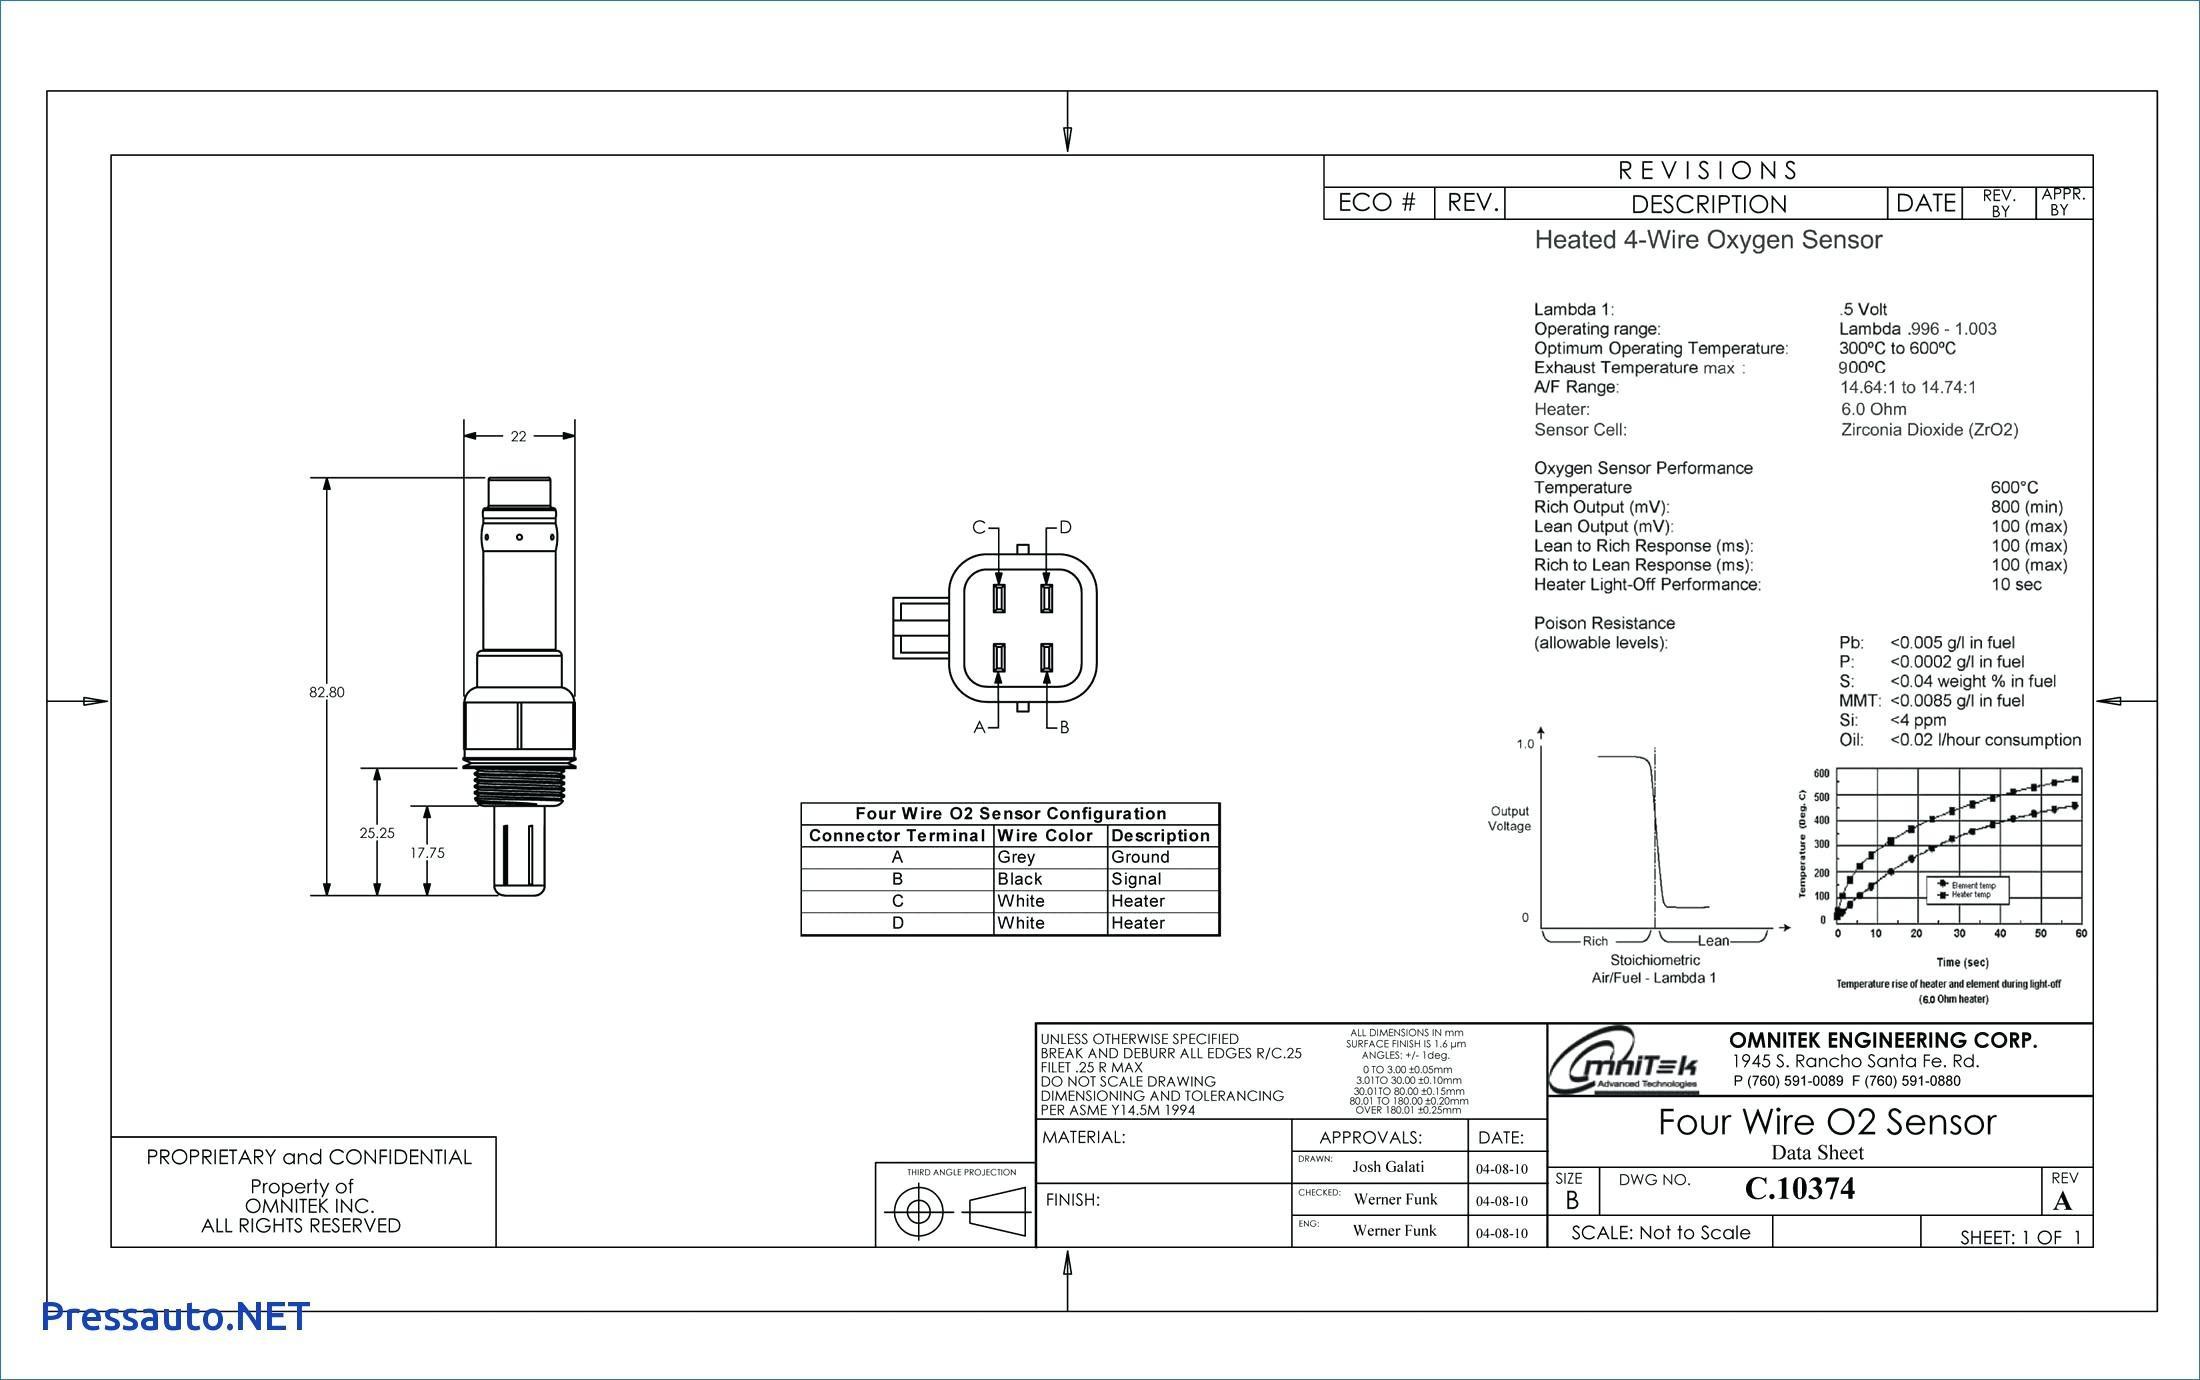 engine diagram animation subaru 2 0 boxer engine diagram wiring data rh detoxicrecenze com Subaru Boxer Engine Layout Subaru Boxer Engine Layout